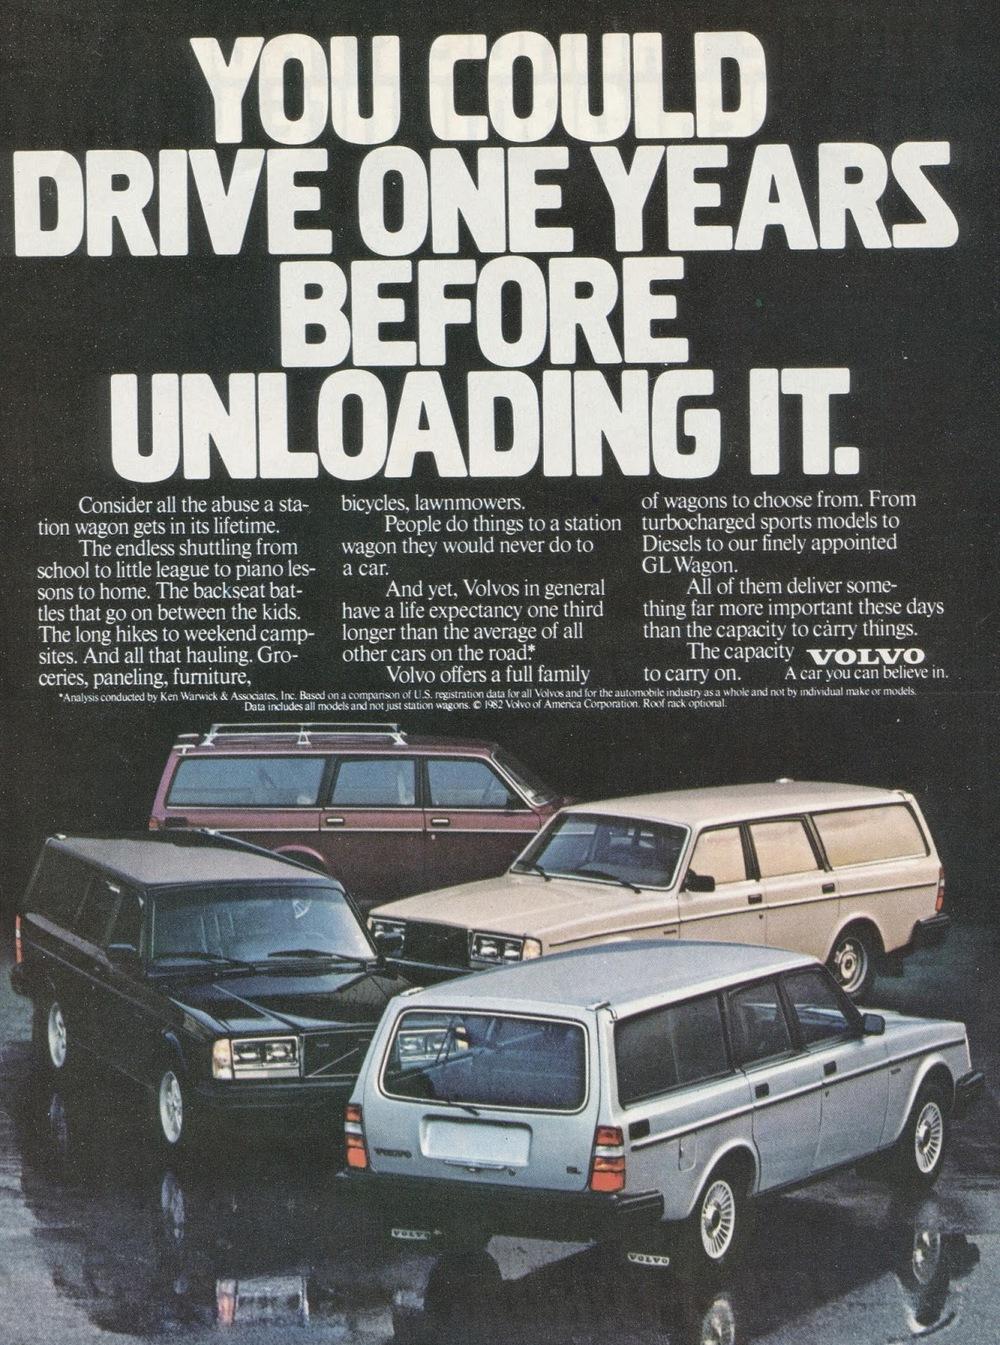 My Volvo 240 Wagon (Slow, Heavy, Practical, Timeless) — HARDBARNED!